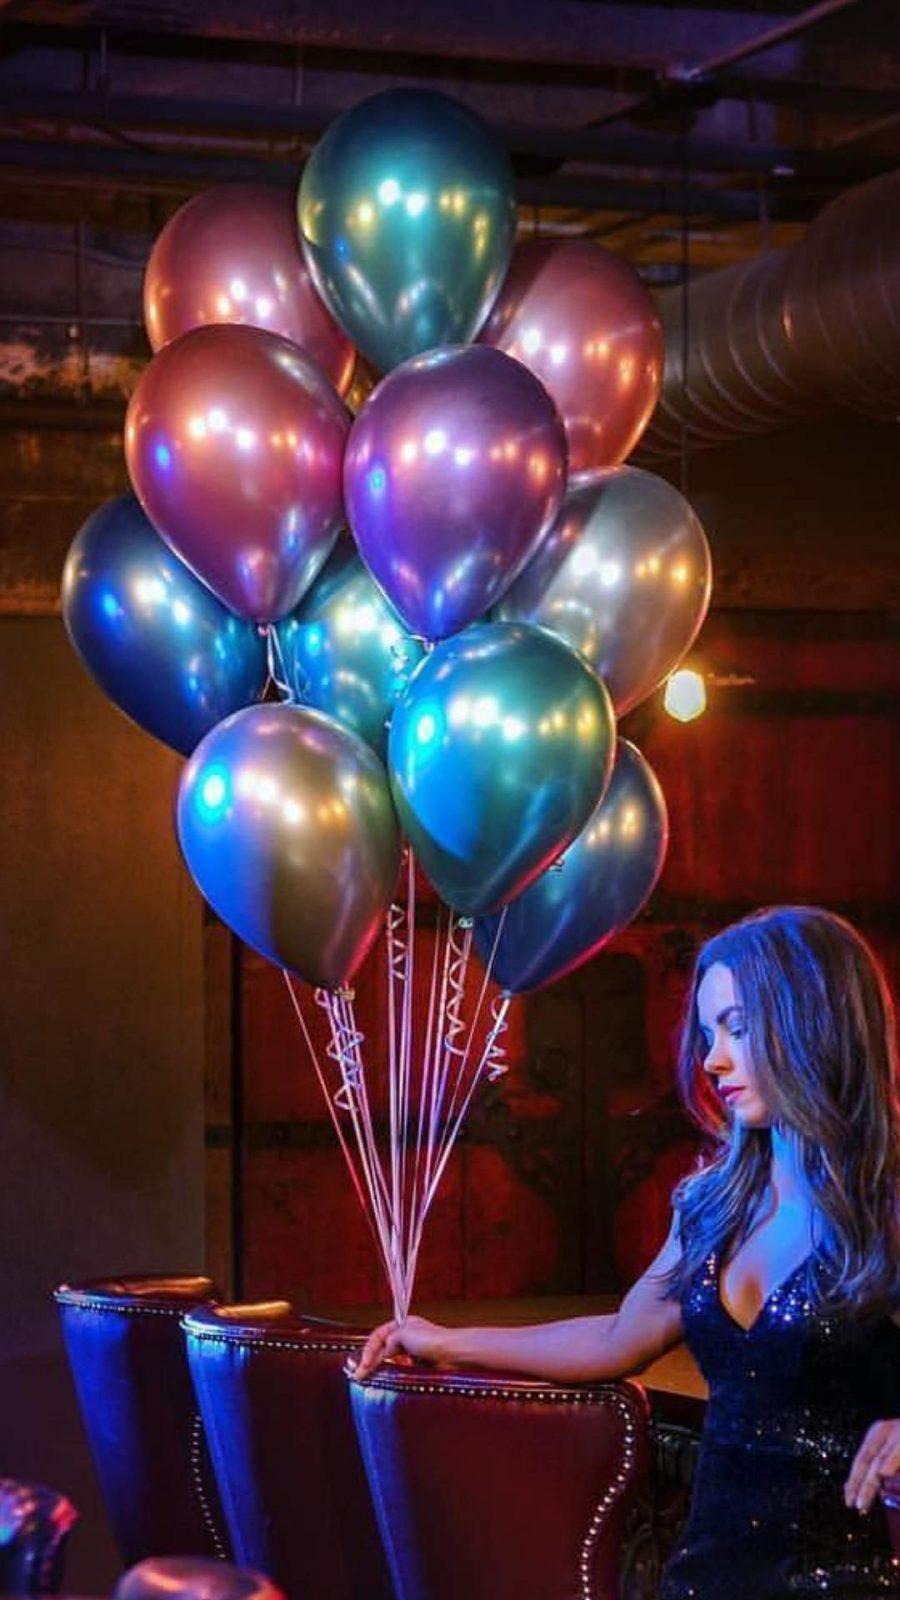 Chrome Rosegold λάτεξ μπαλόνι